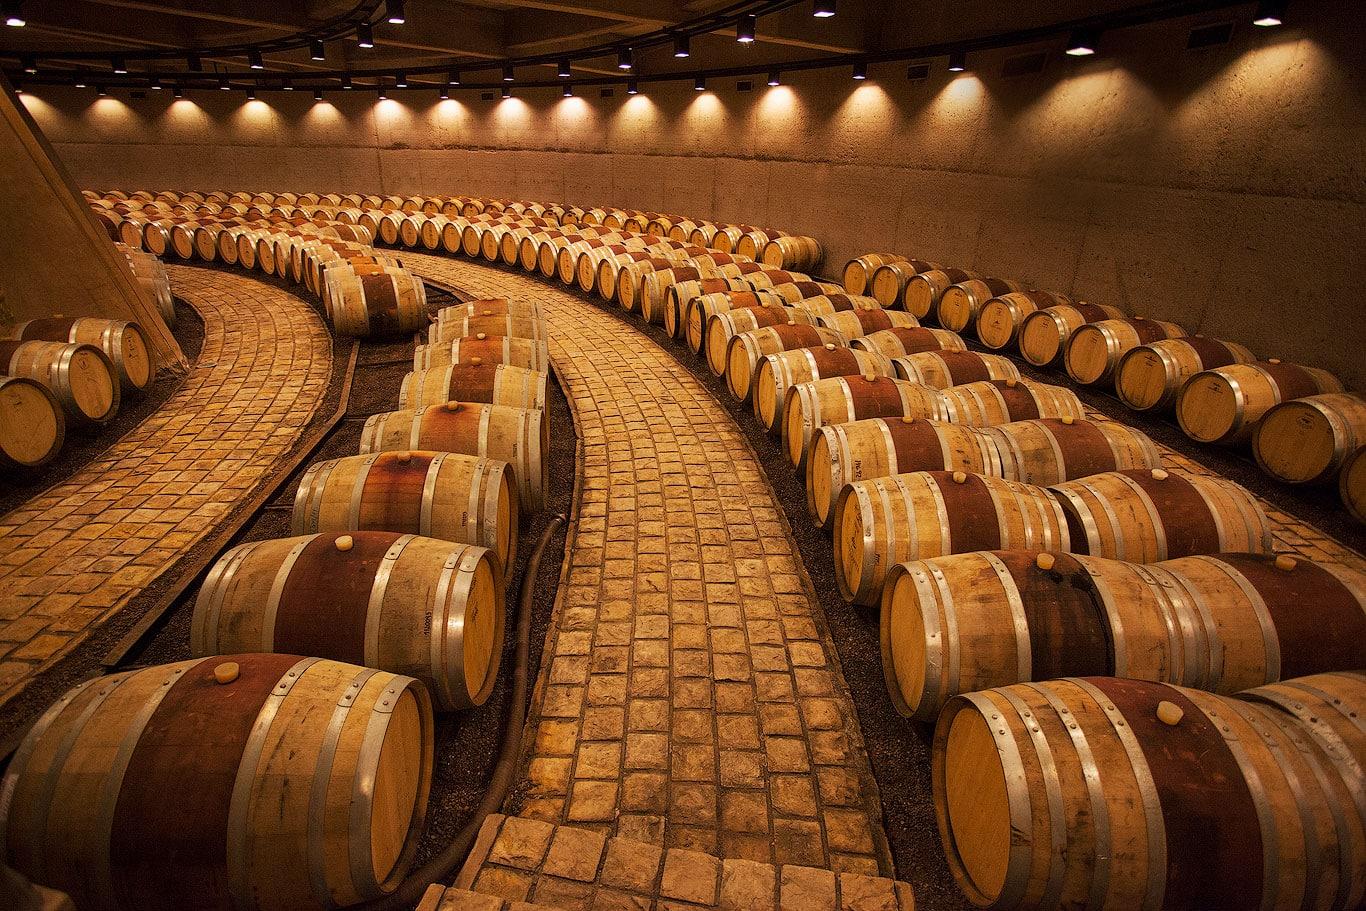 Oak barrels inside Bodega Zapata, Mendoza, Argentina